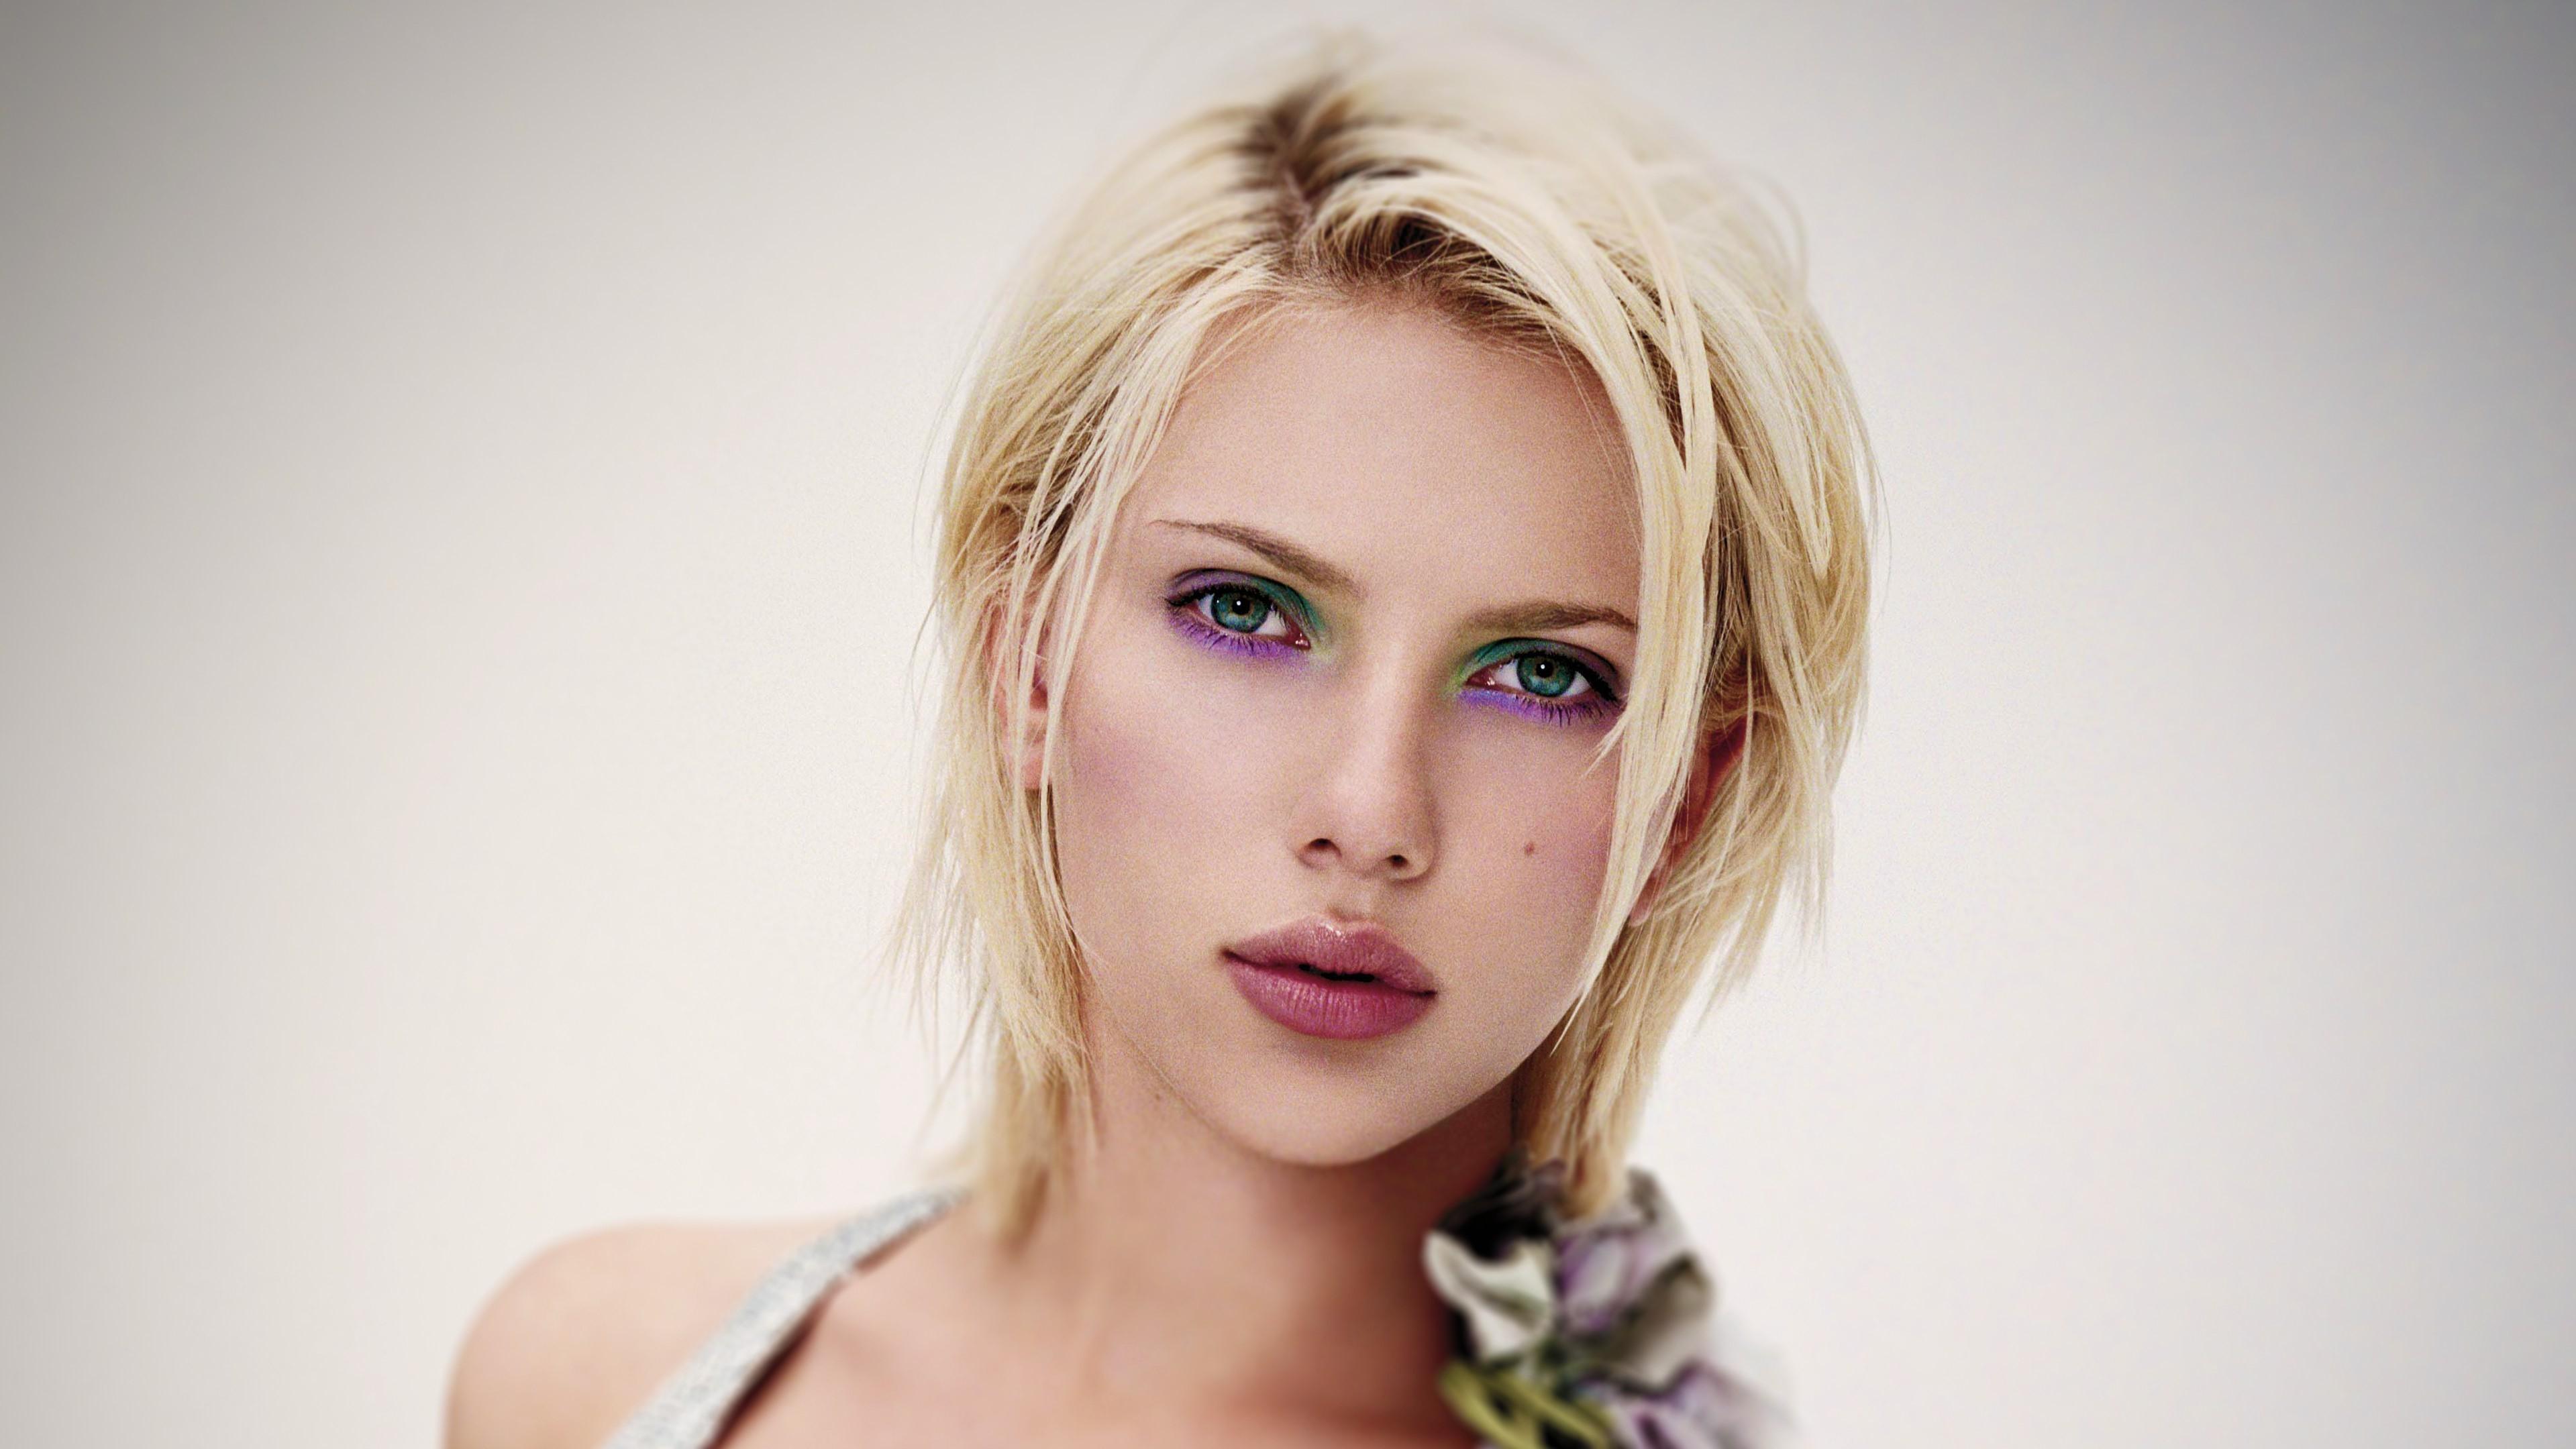 Coupe Tres Courte Femme Blonde Platine | Coiffures Cheveux Longs